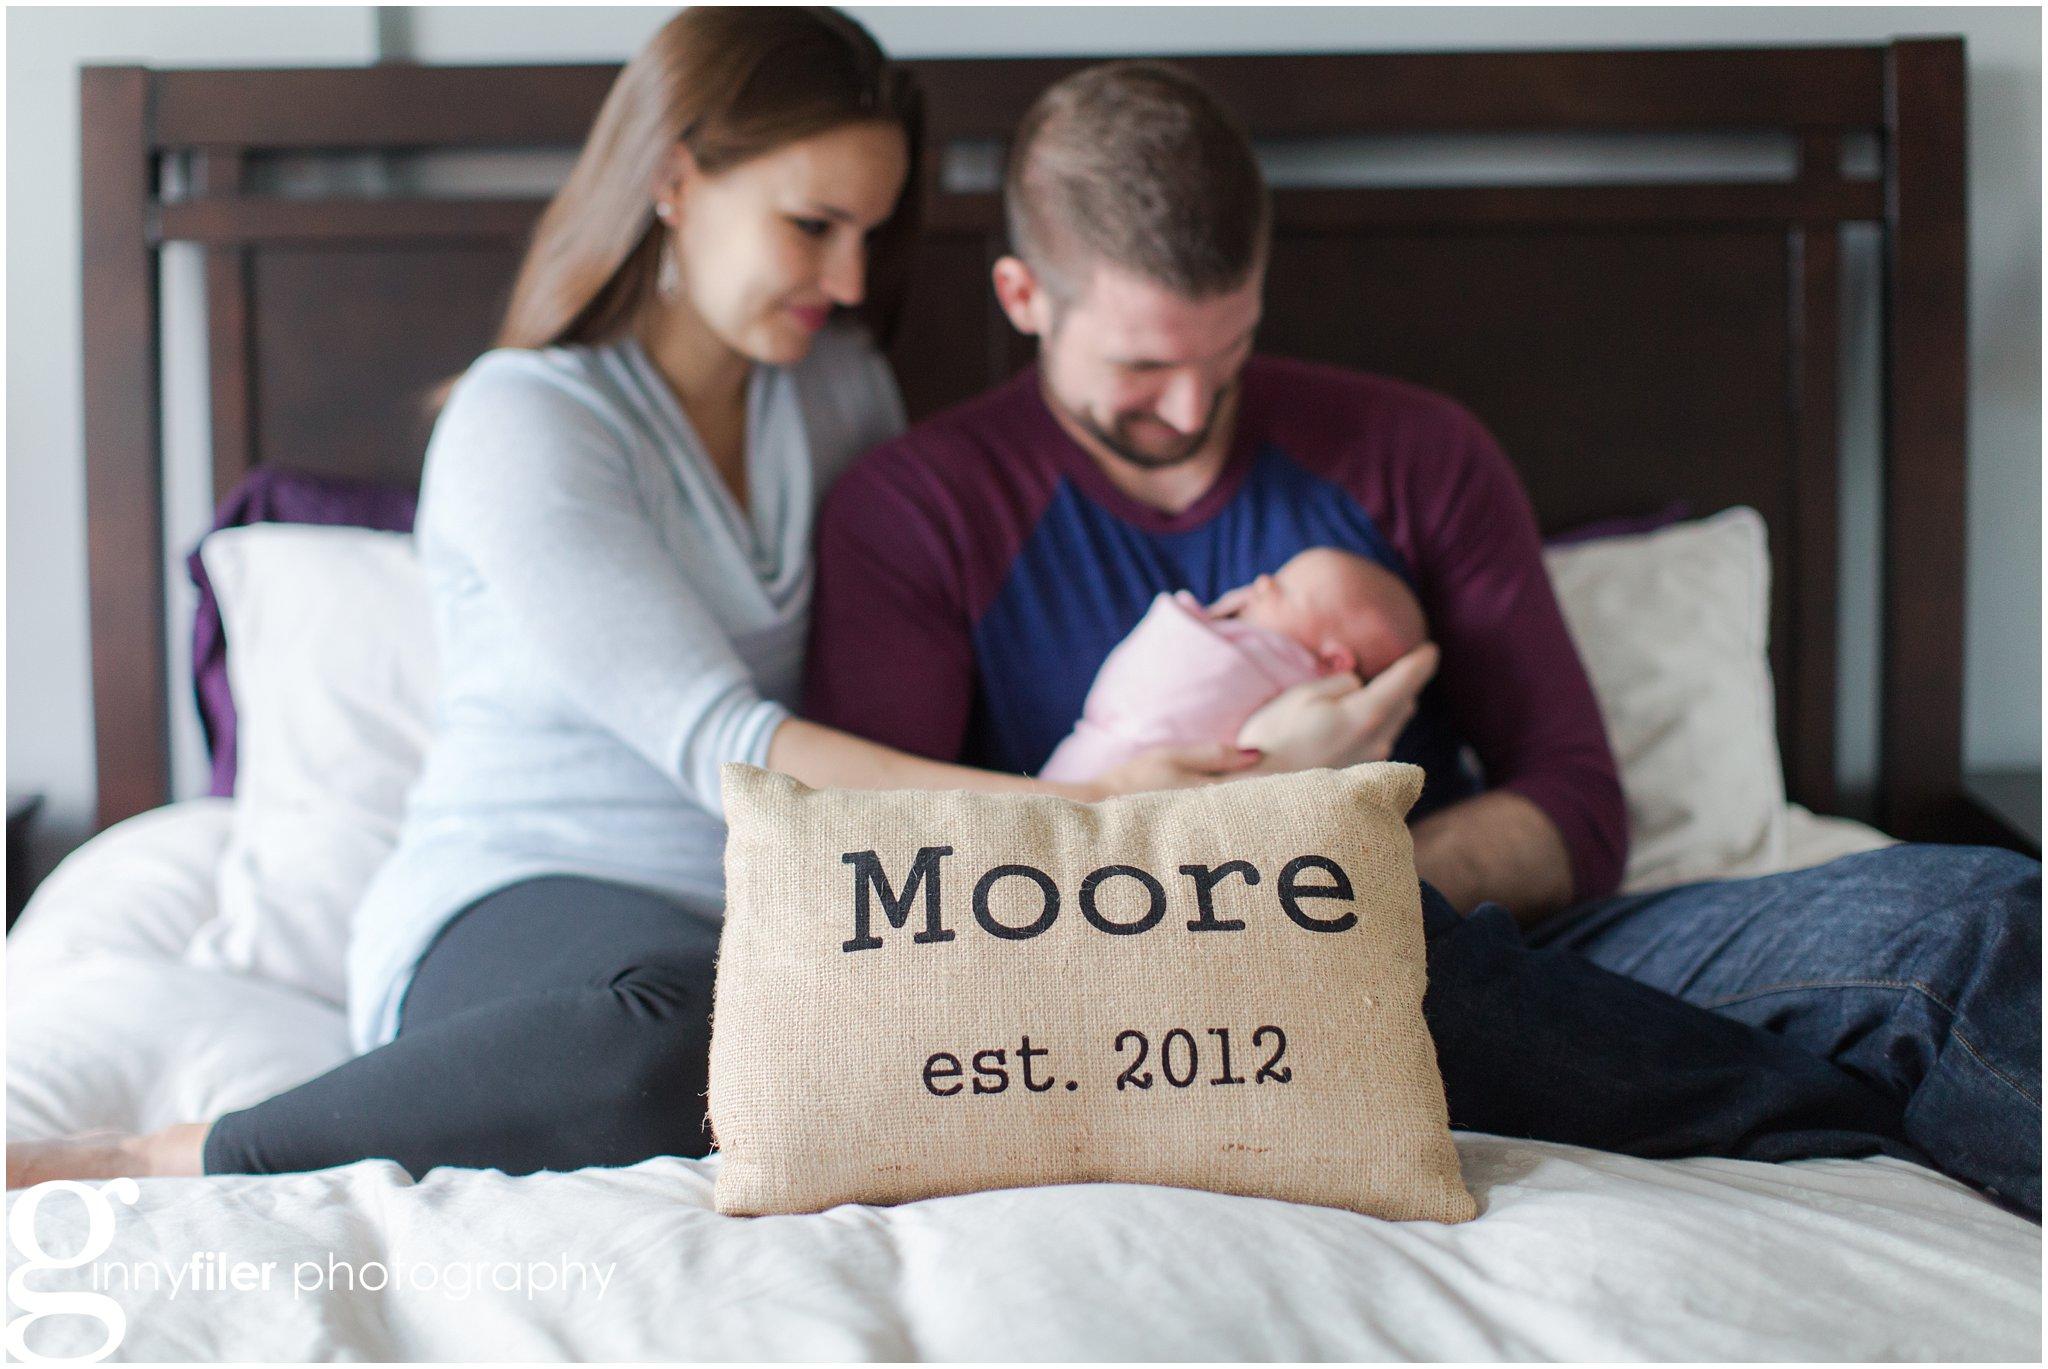 newborn_photography_Moore_0013.jpg